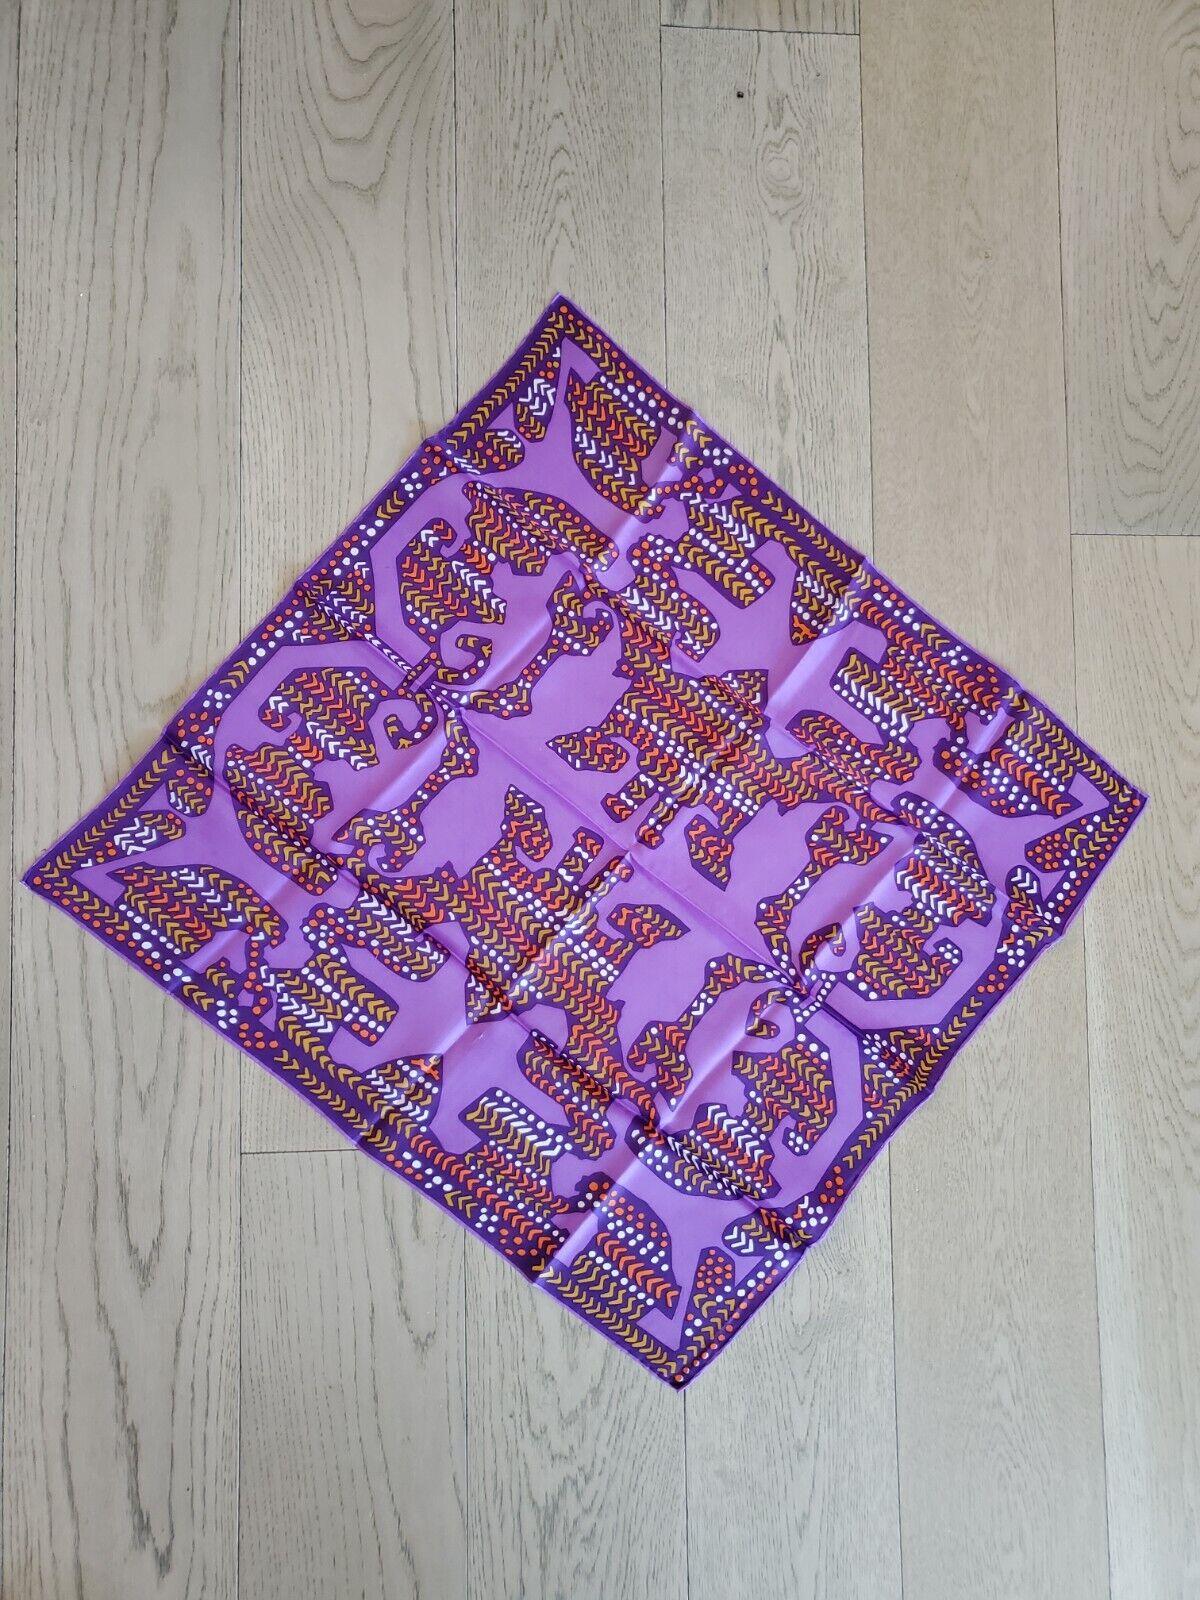 VTG Rayon, Silk Retro Mod MCM Tribal Scarf Japan Purple Orange Mustard White